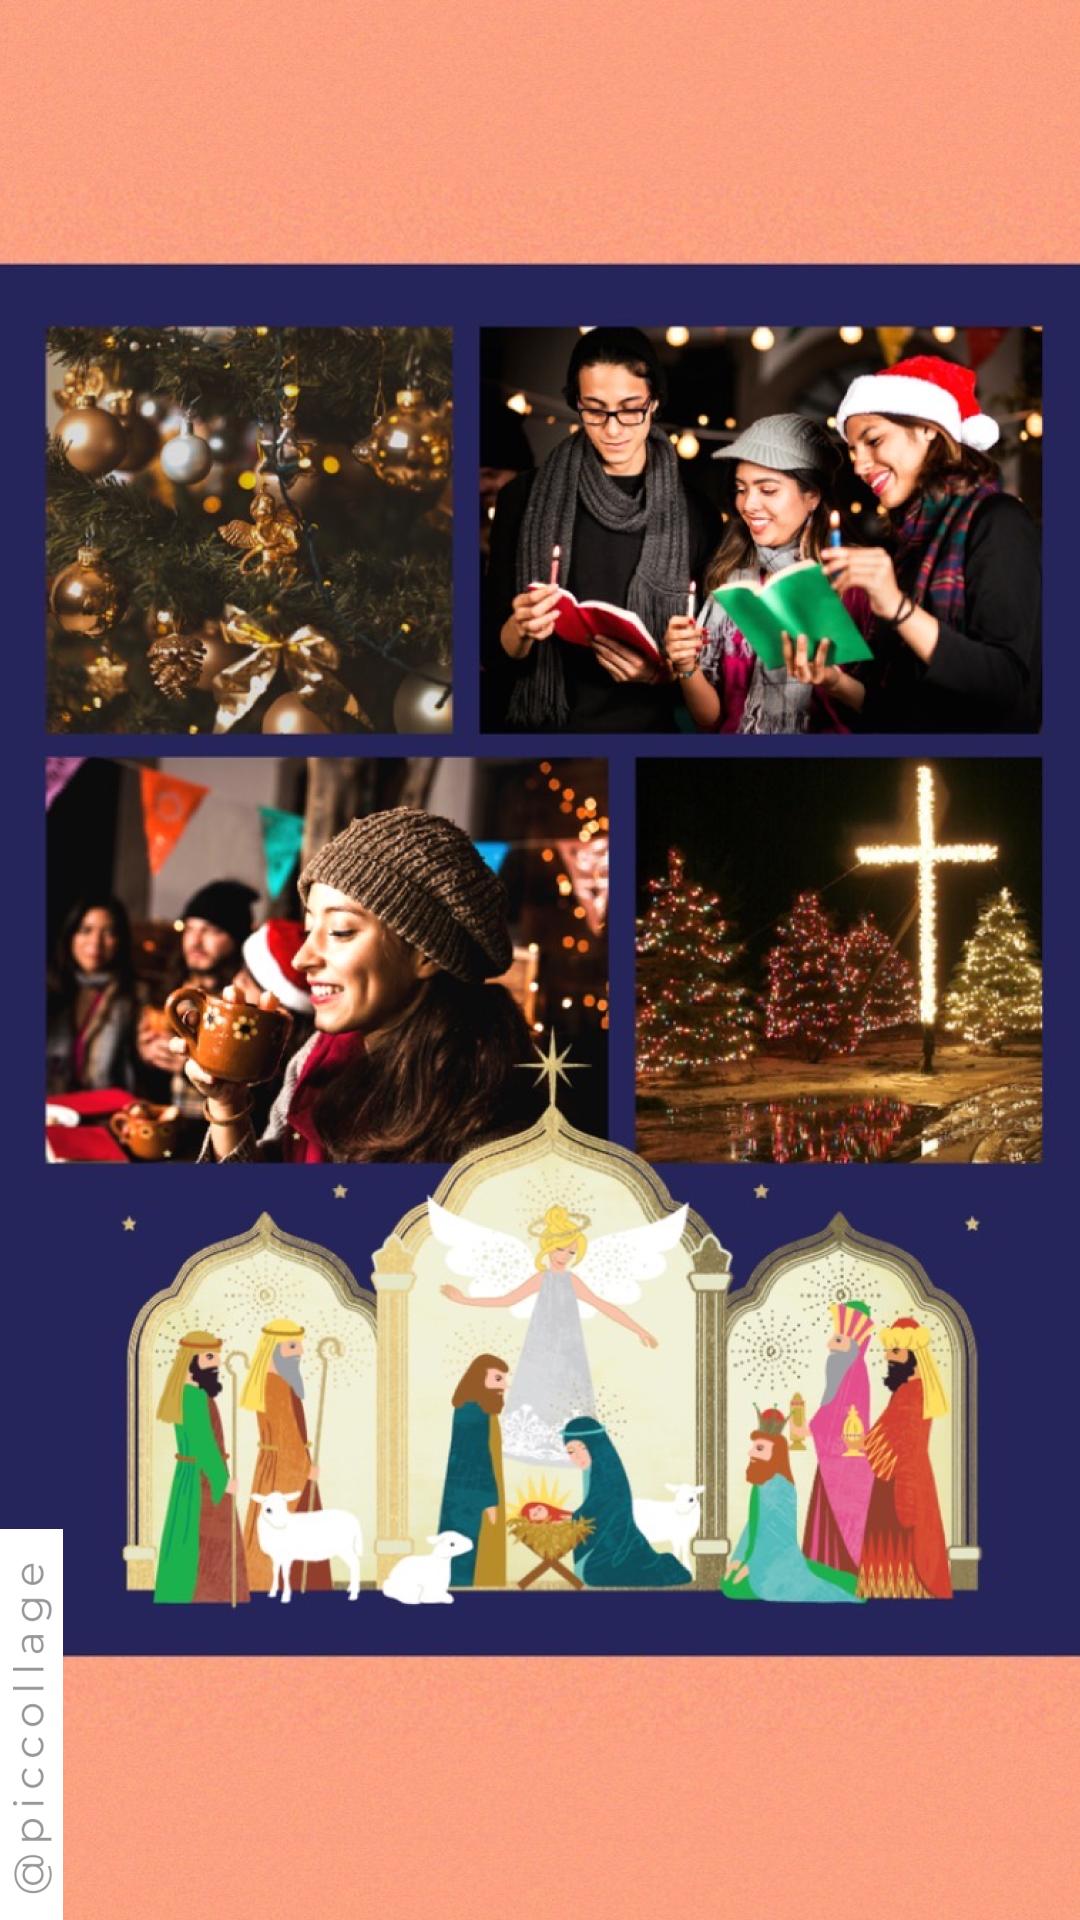 Christmas Greeting Card Template Christmas Greeting Card Template Christmas Card Template Greeting Card Template